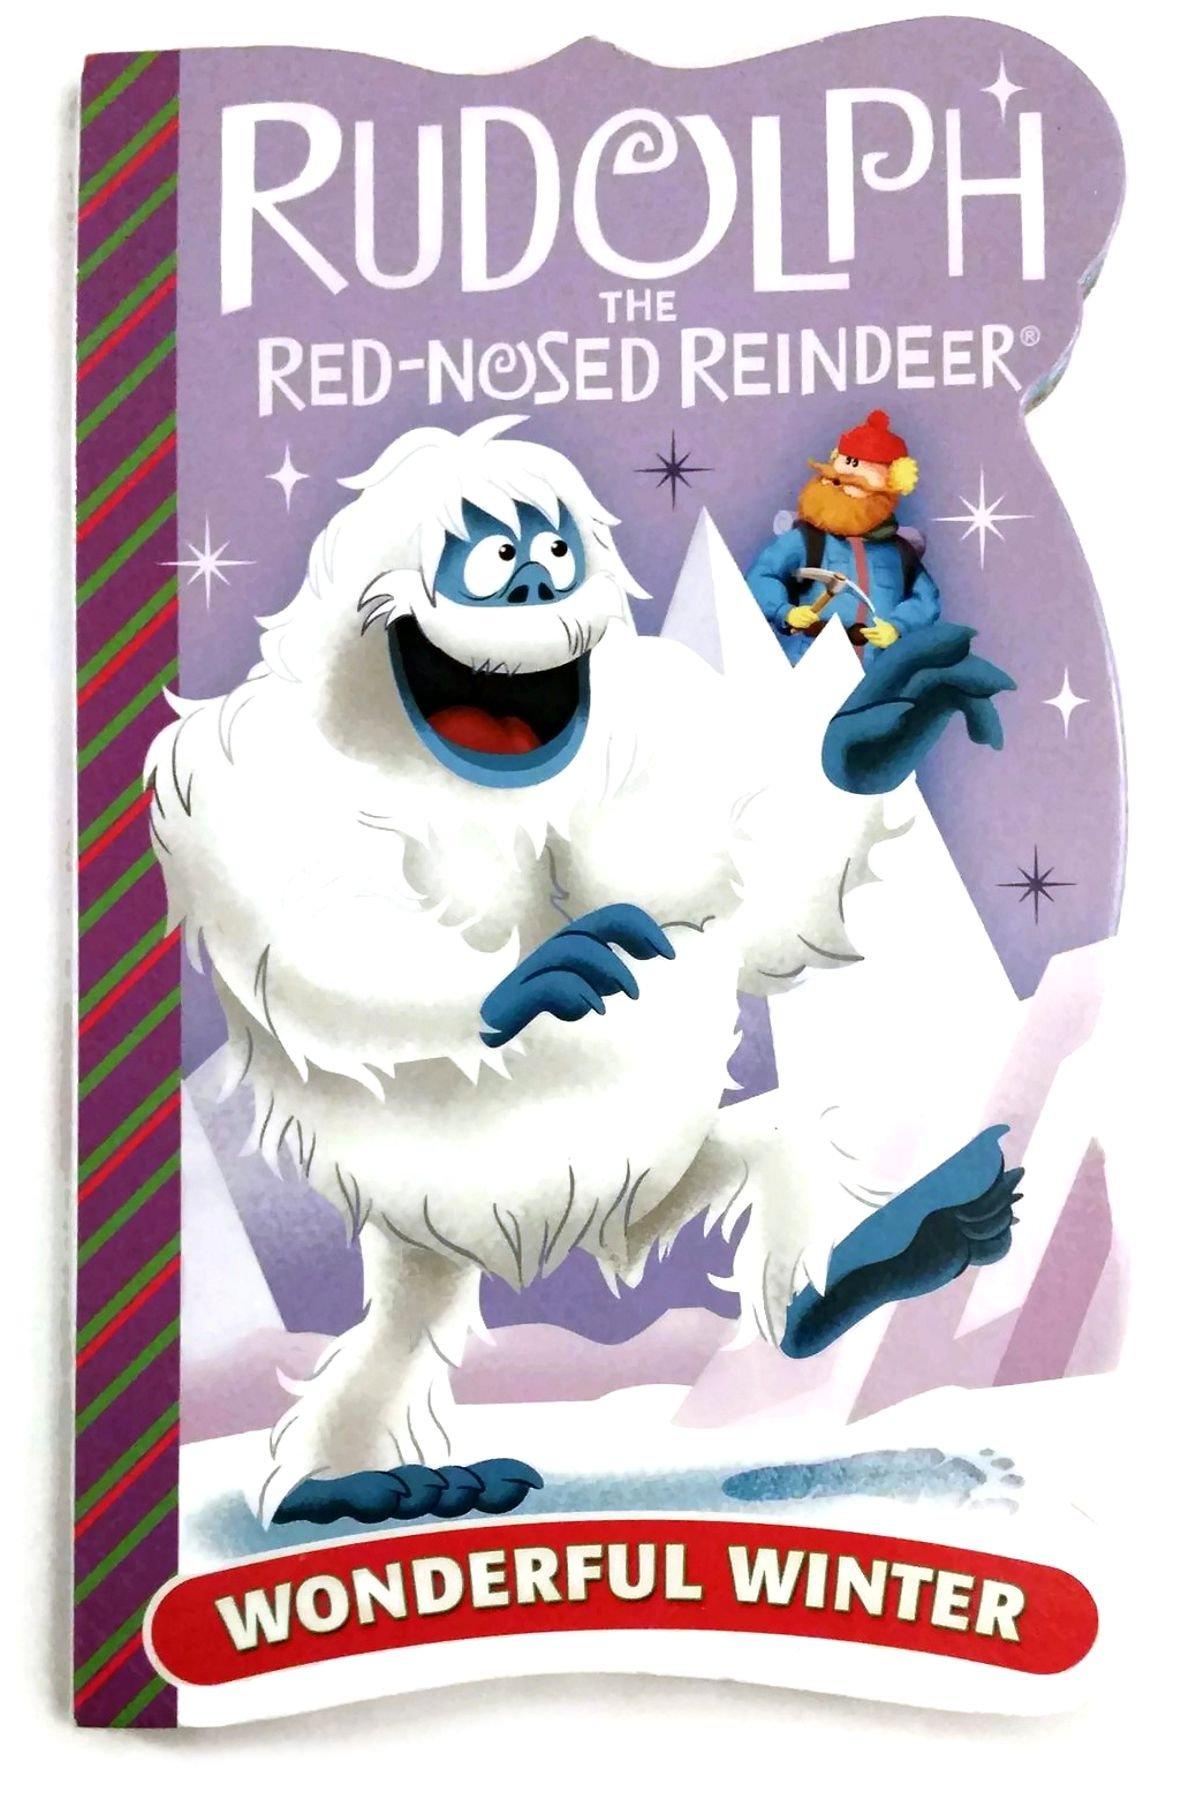 Rudolph Wonderful Winter.jpg